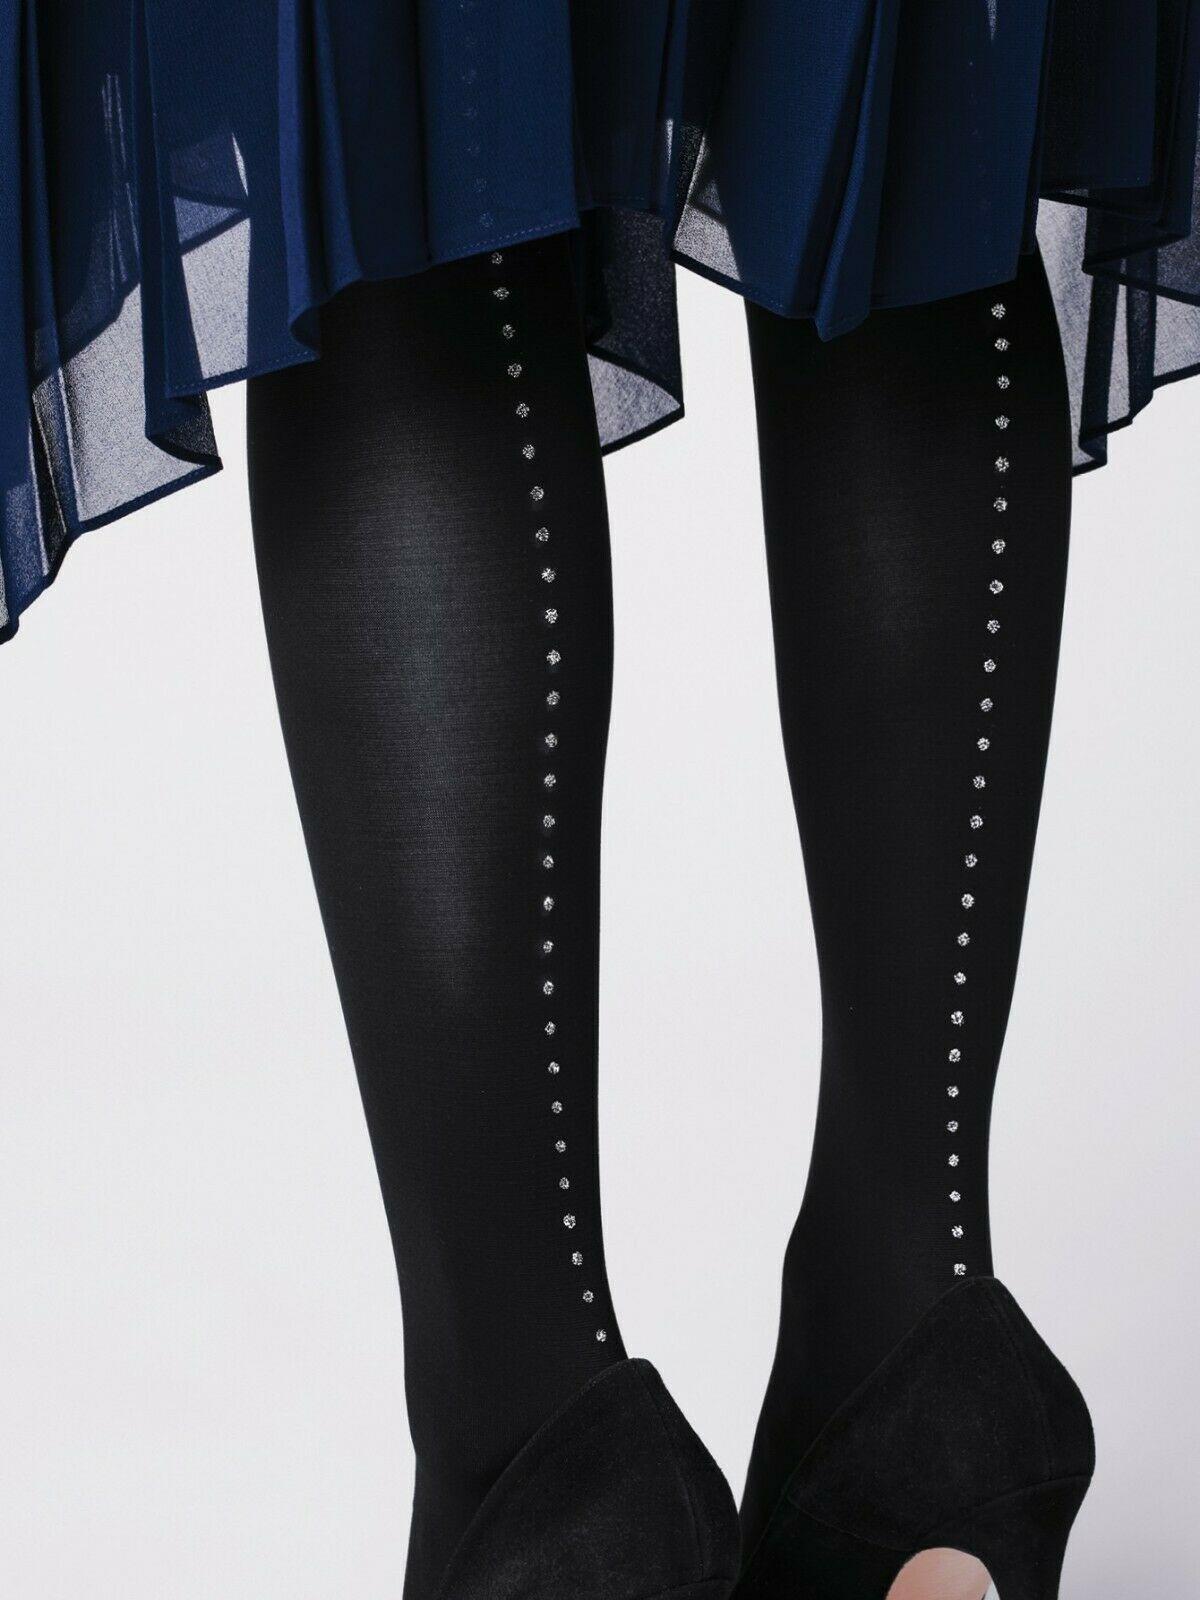 Collant opaque avec petits points brillants qui descendent le long de la jambe